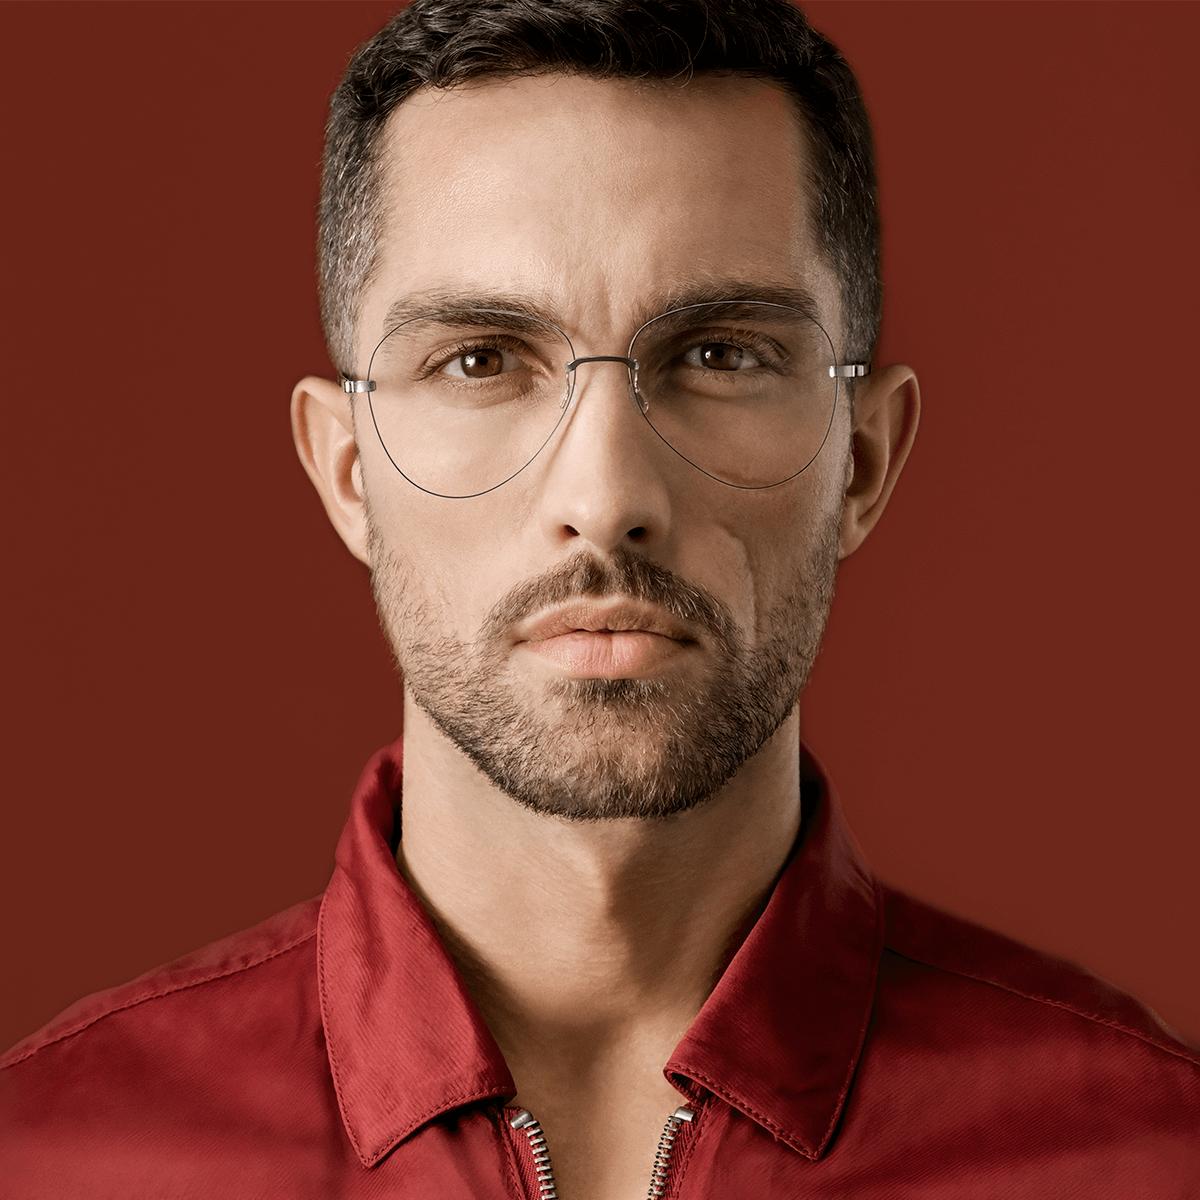 Augenoptik Kleve Rosenberg - LINDBERG Händler